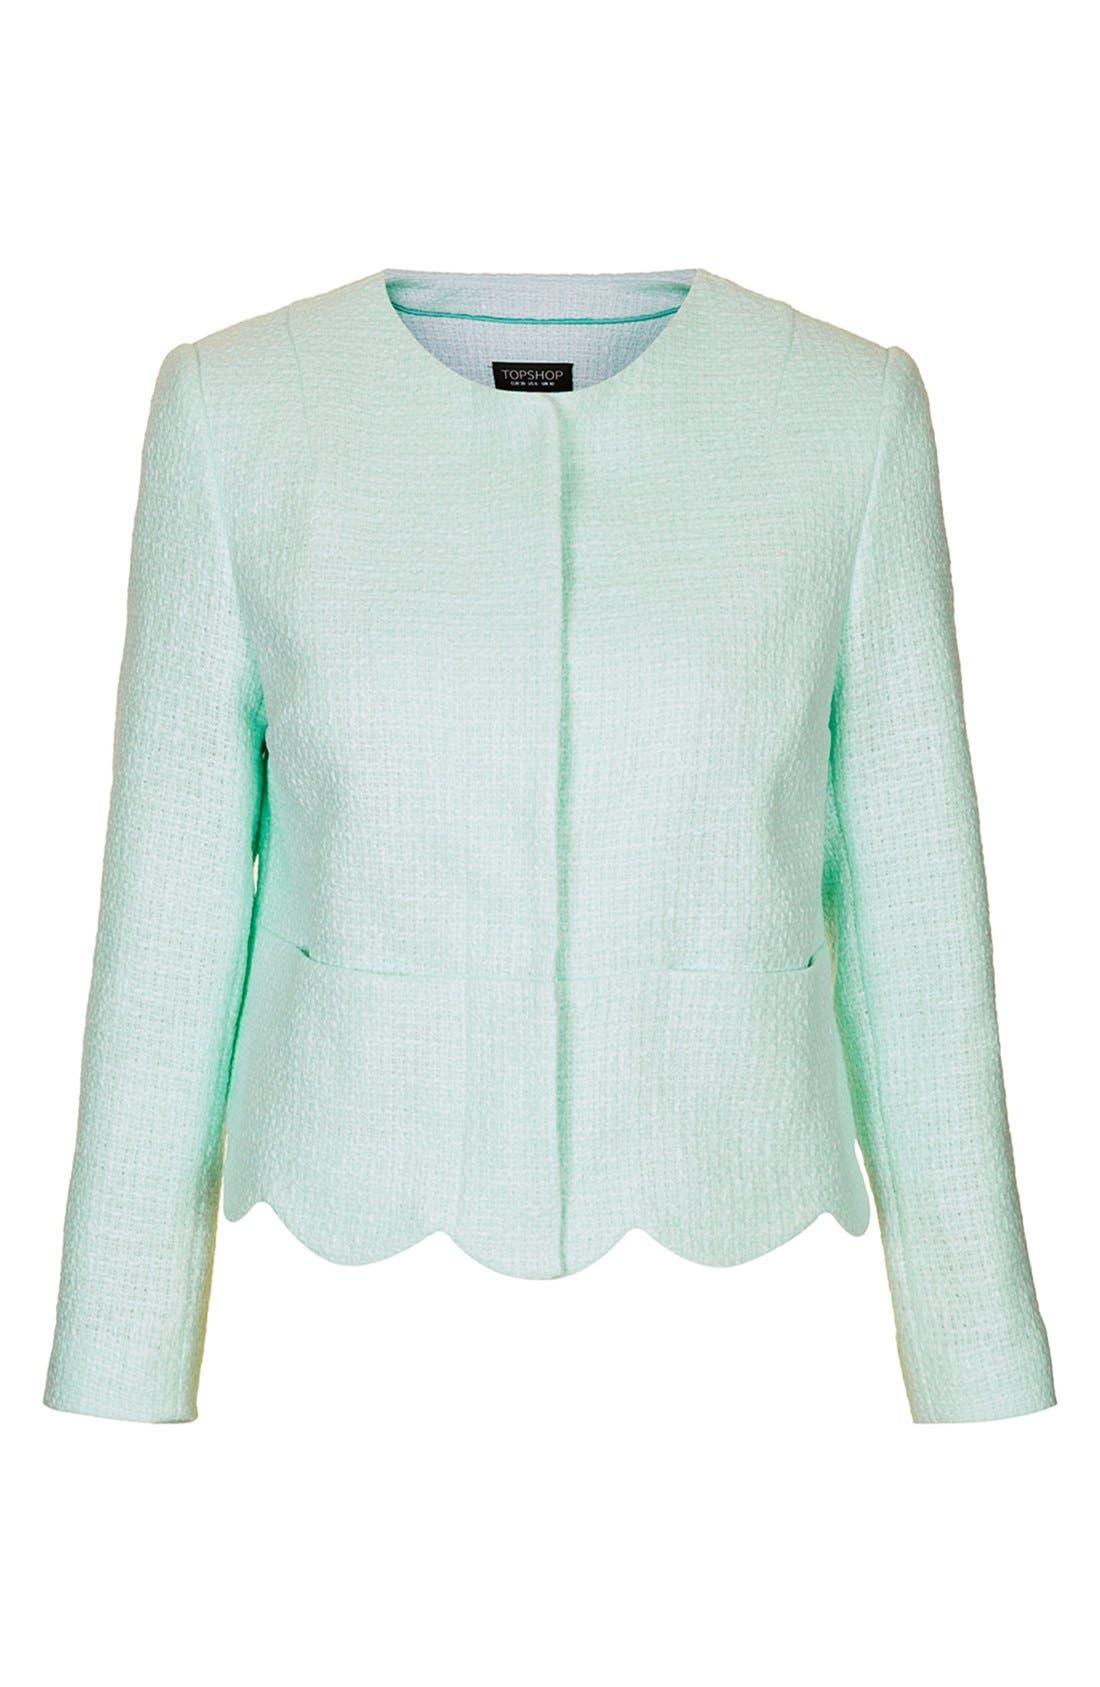 Alternate Image 3  - Topshop 'Betty' Scalloped Coated Bouclé Jacket